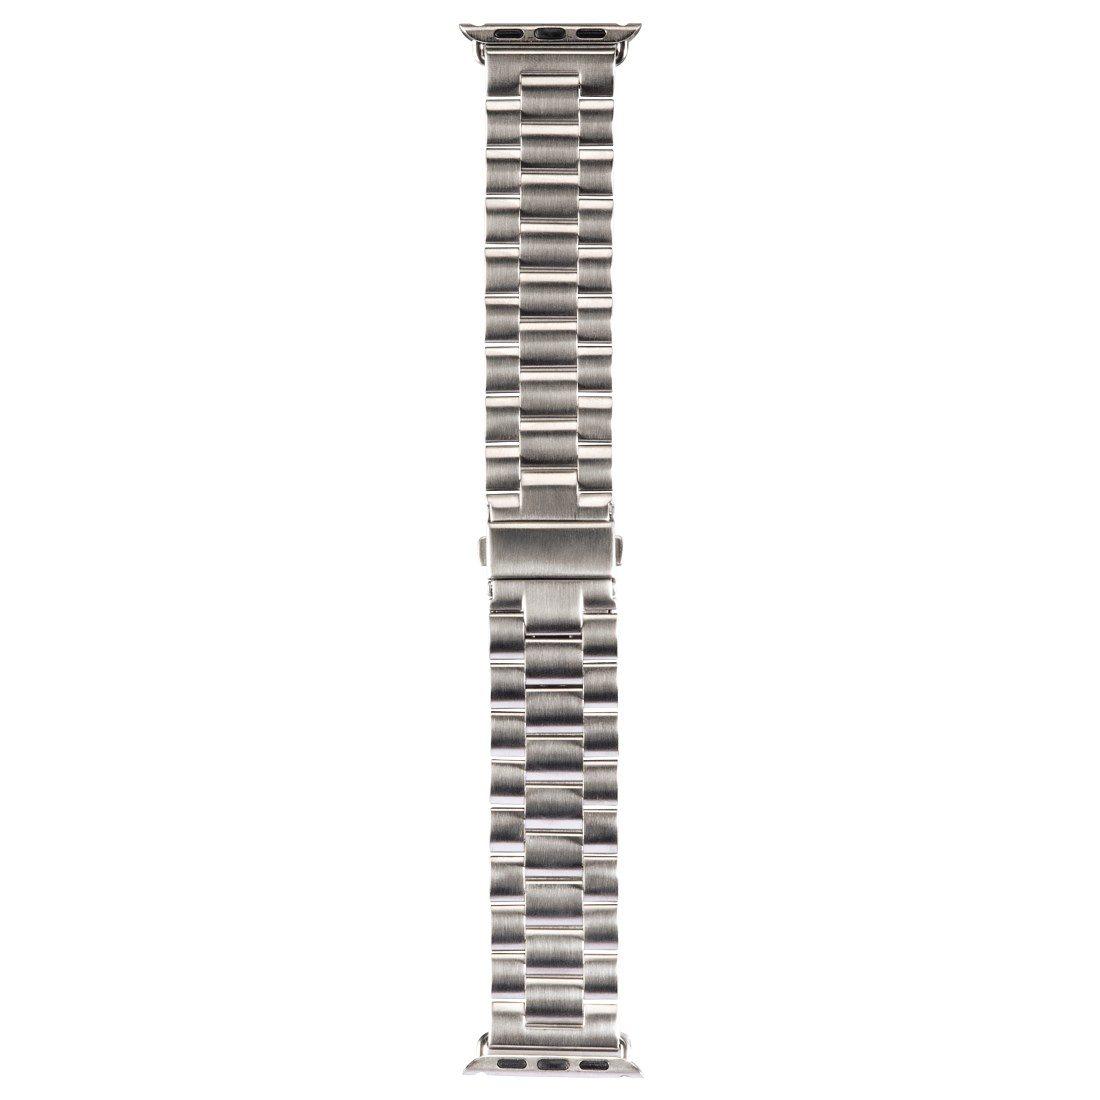 Hama Armband für Apple Watch 42 mm Uhrenarmband Edelstahl »Wechselarmband Ersatzband«